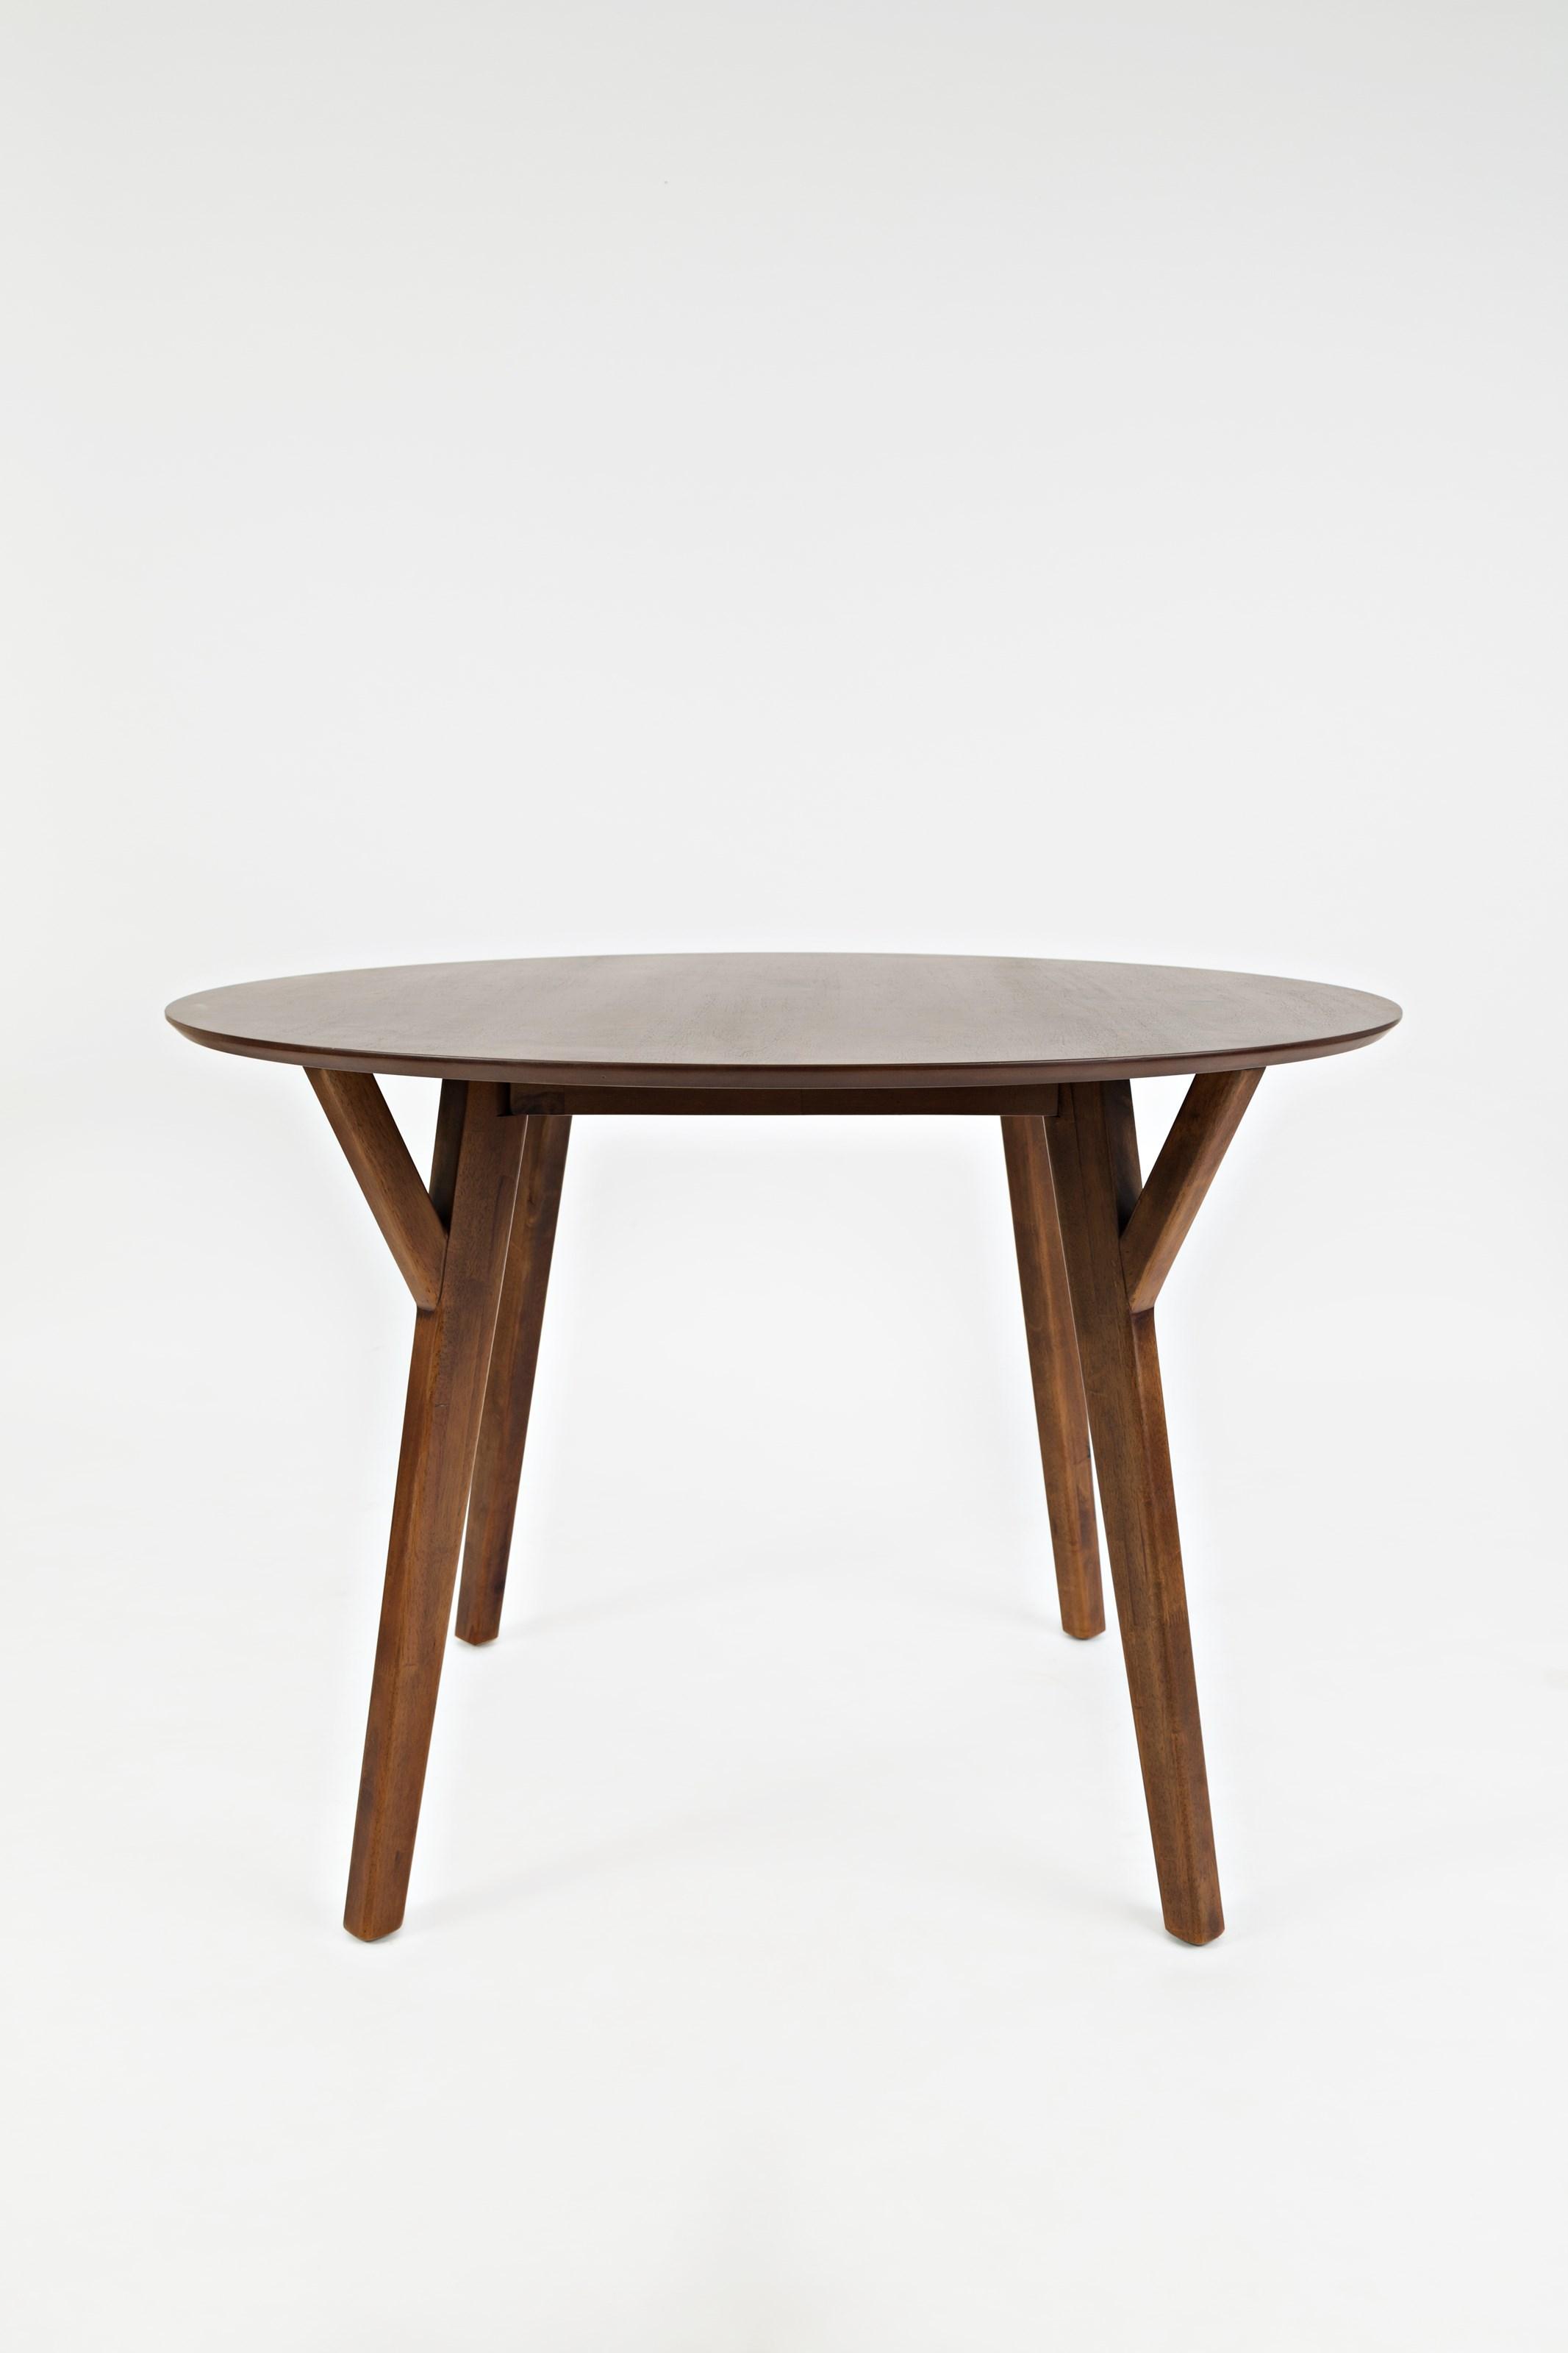 Copenhagen Round Dining Table by Jofran at Jofran